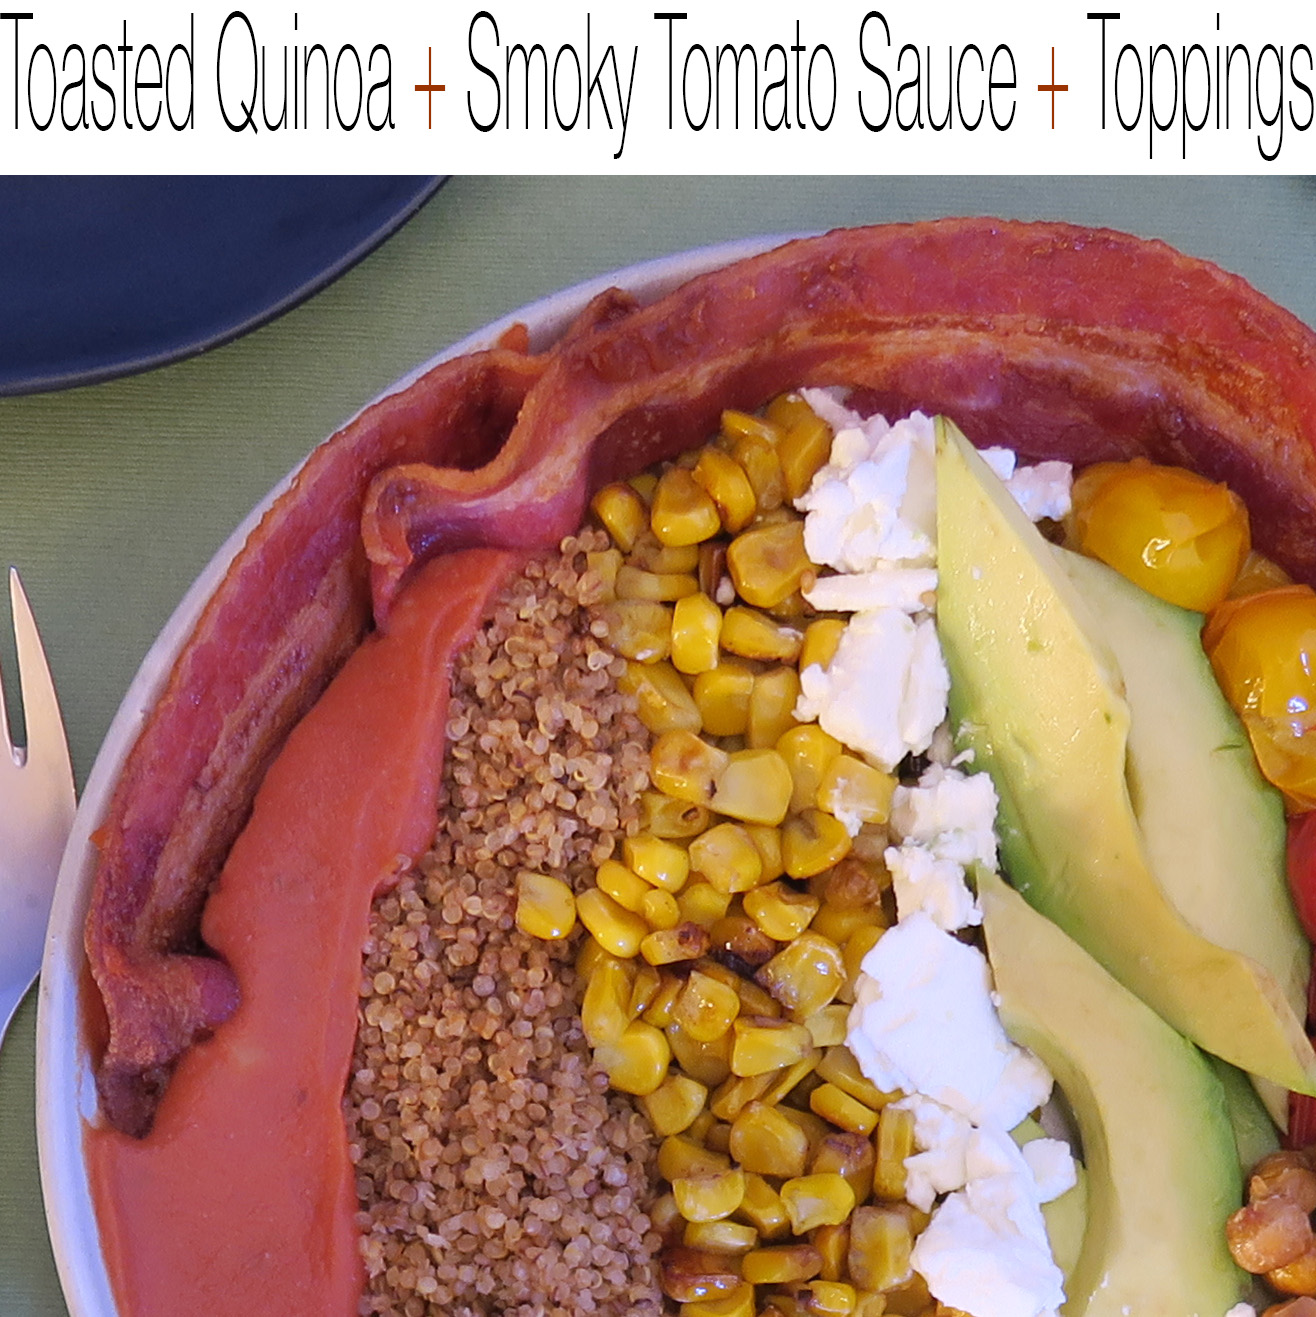 bacon_toasted quinoa with smoky paprika sauce_IMG_1343.jpg